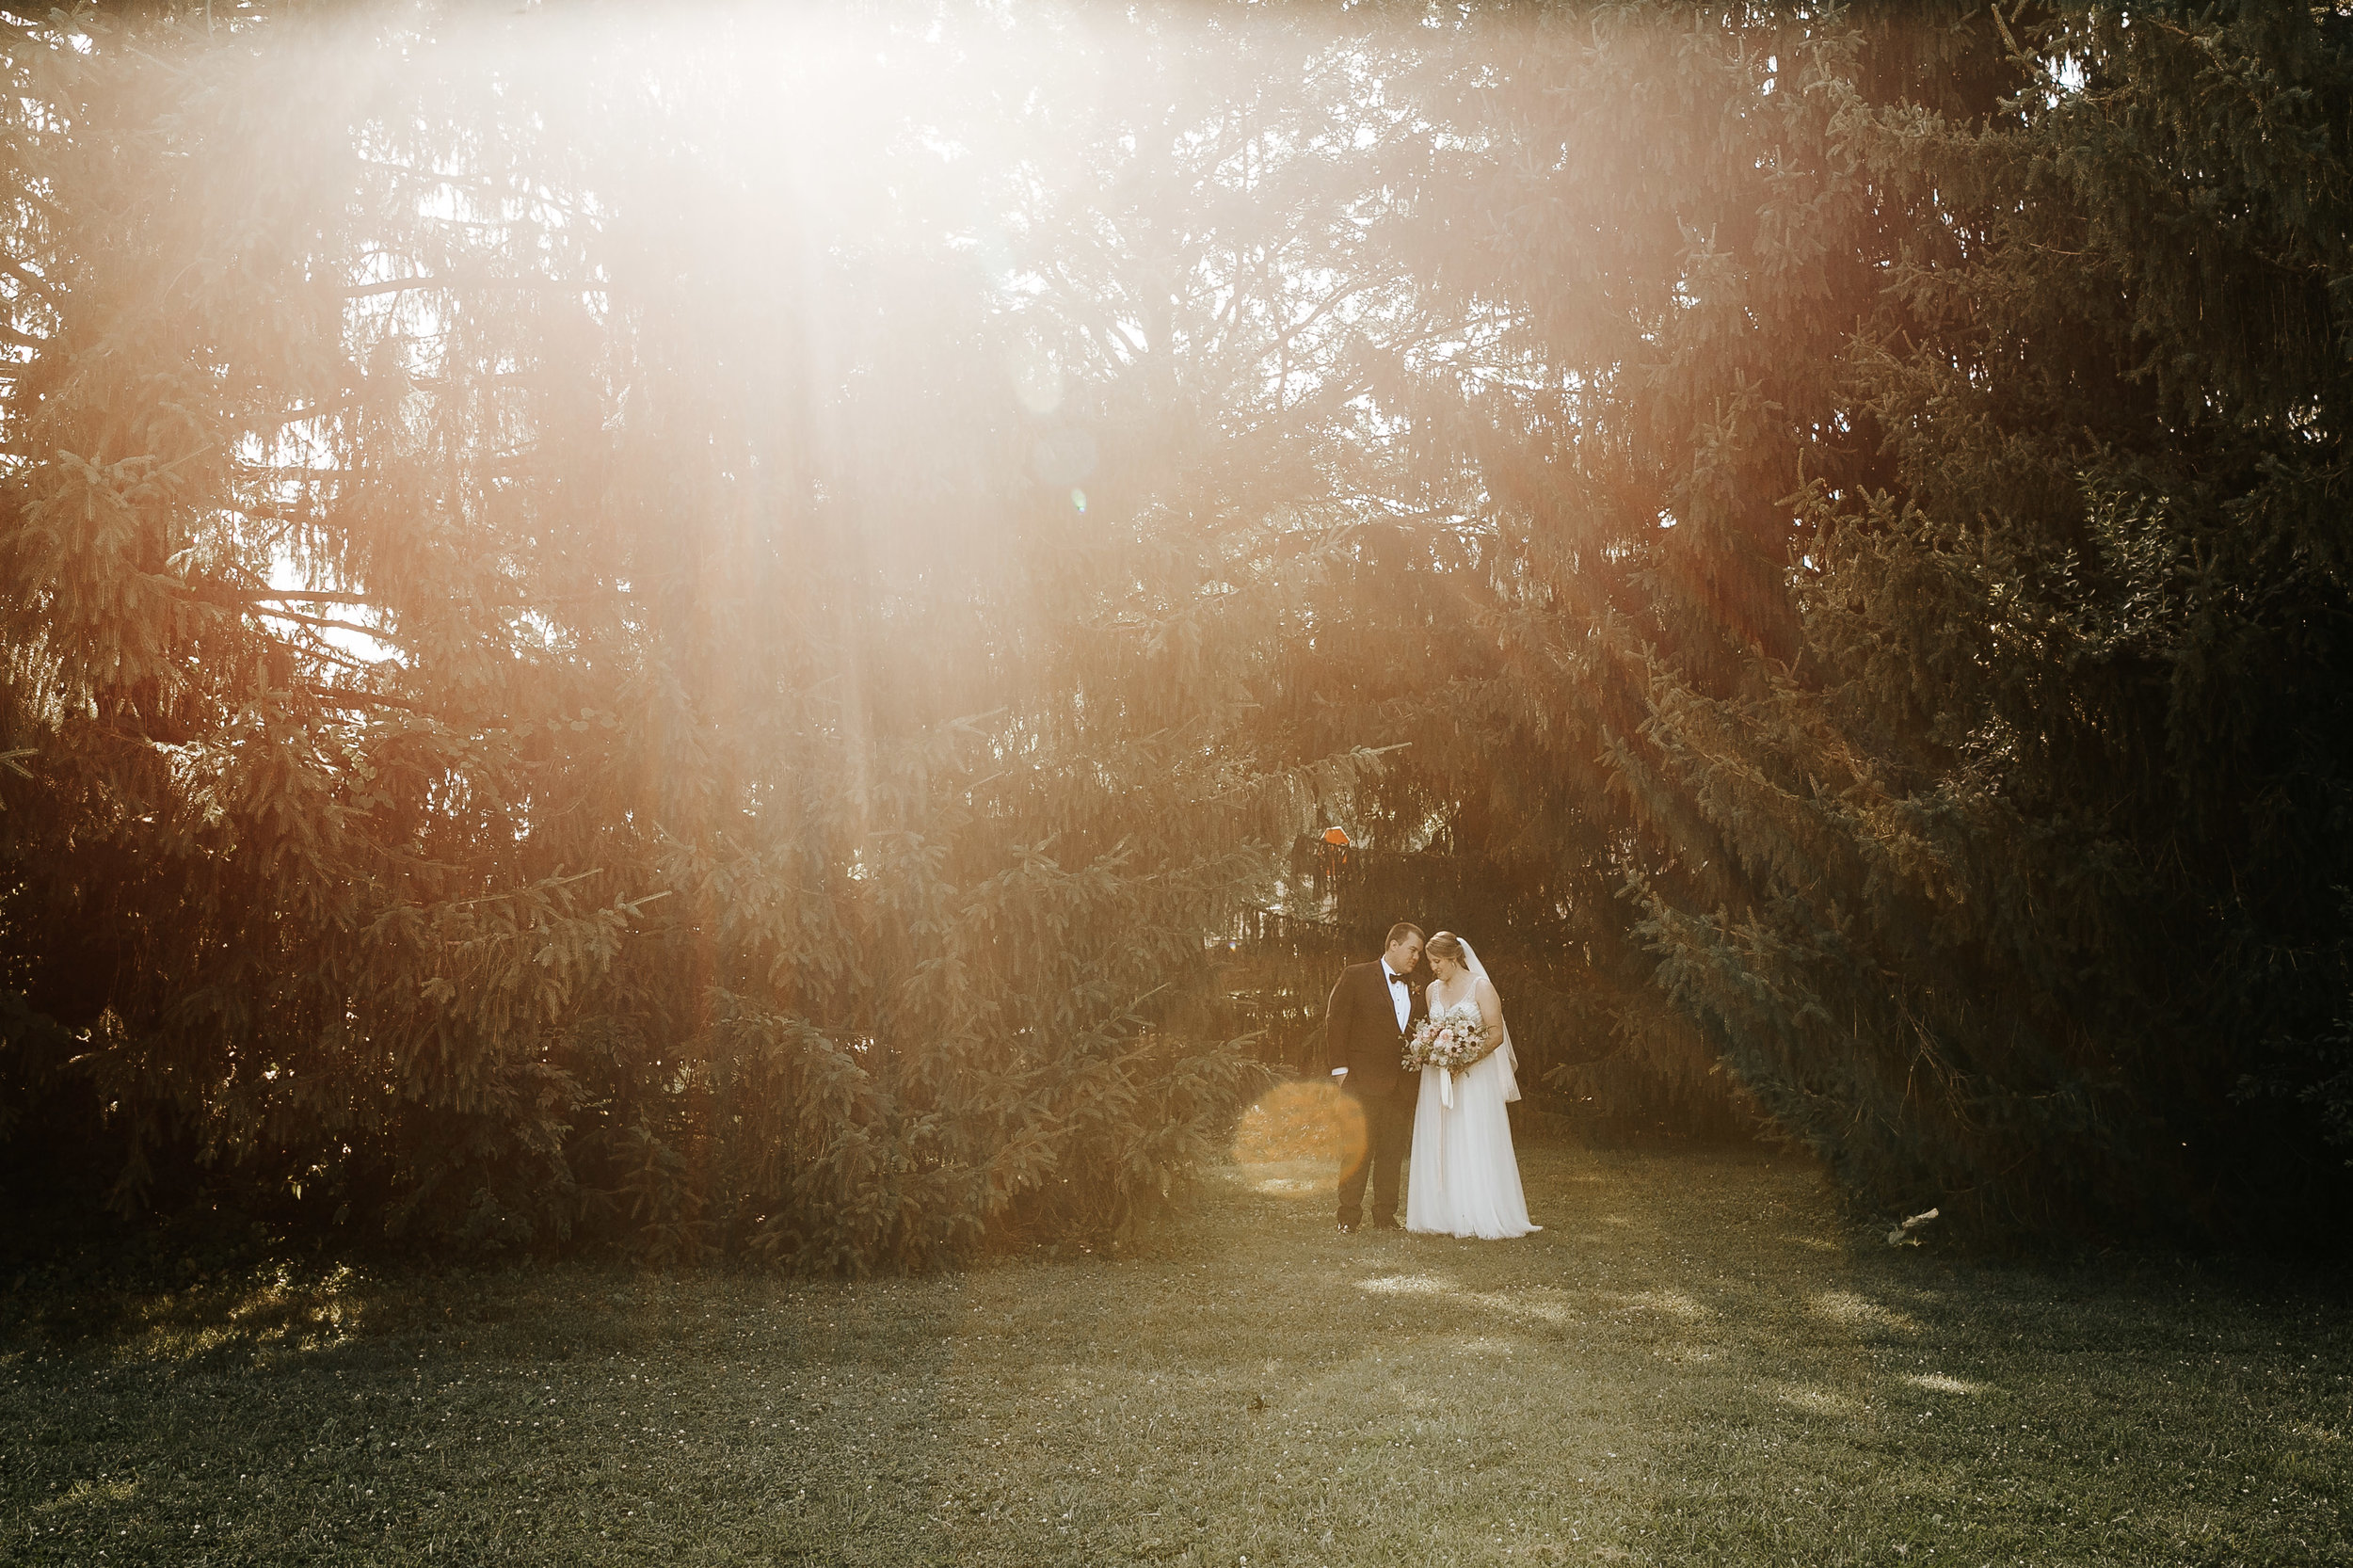 bohemian-photographer-wedding-tennessee-39.jpg